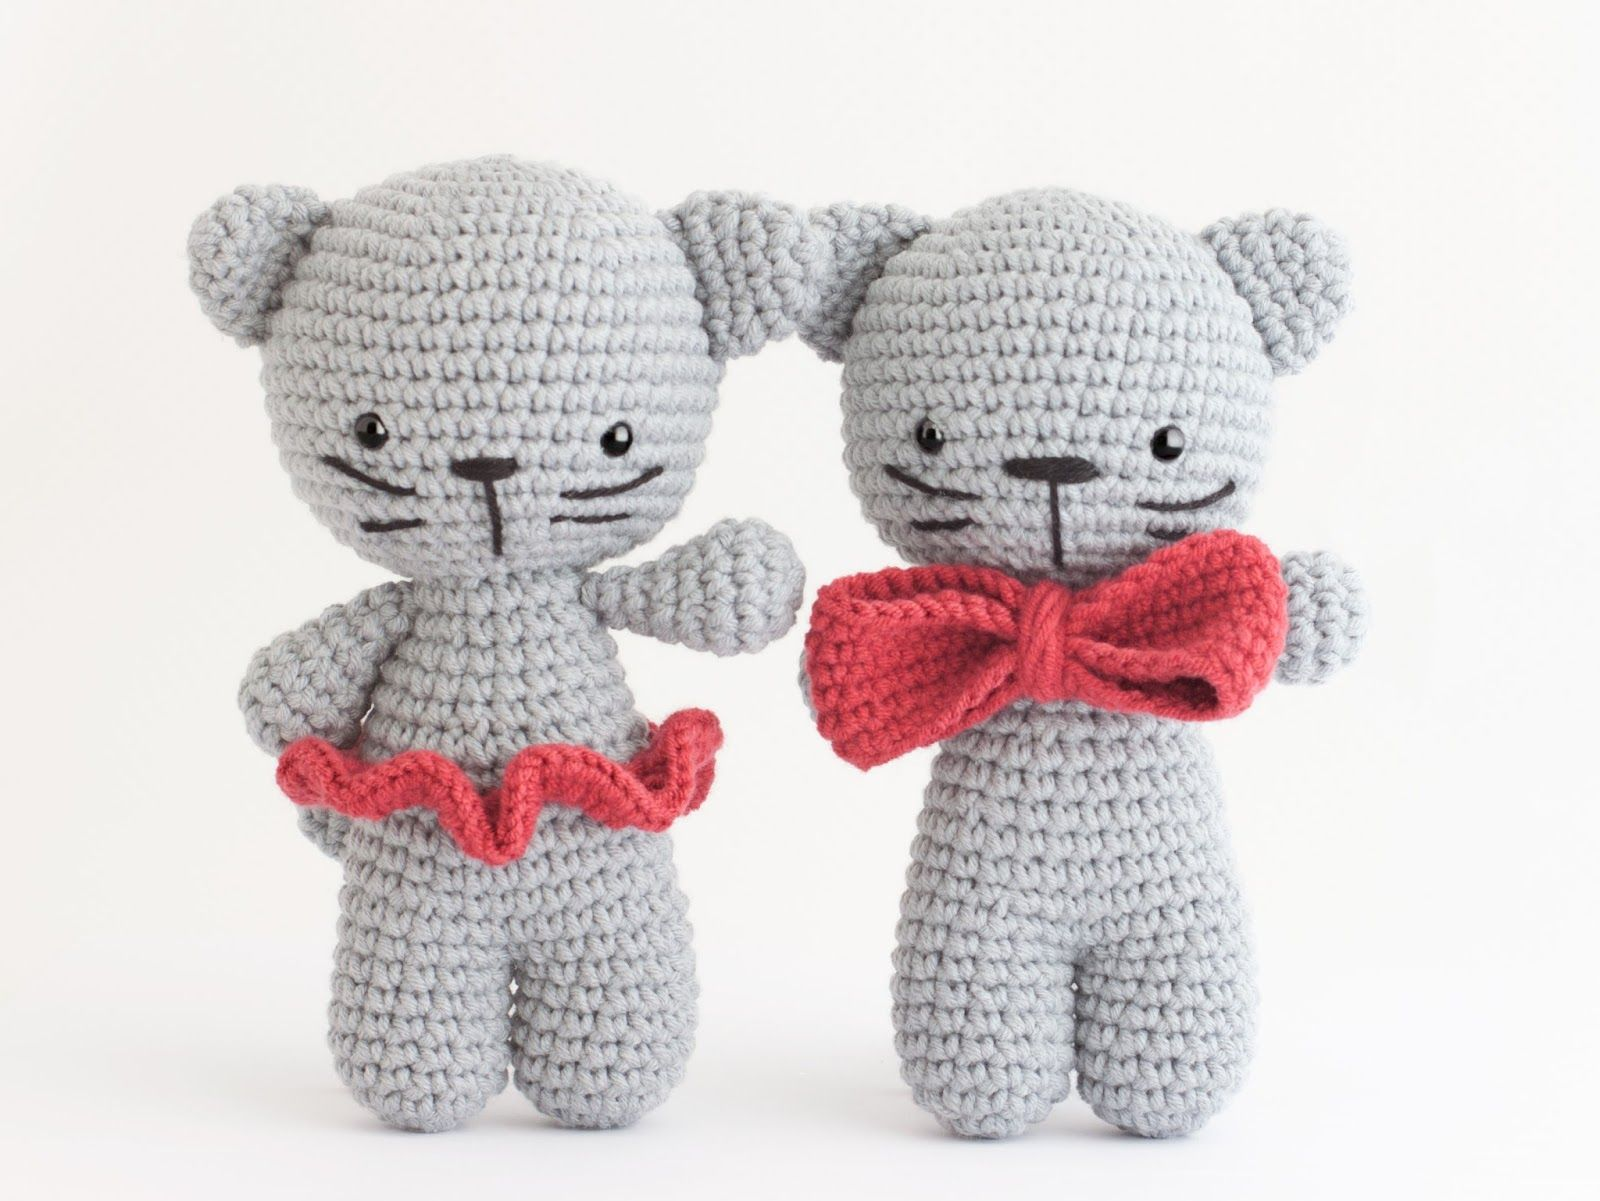 Amigurumi Cat - FREE Crochet Pattern / Tutorial | Crochet ...